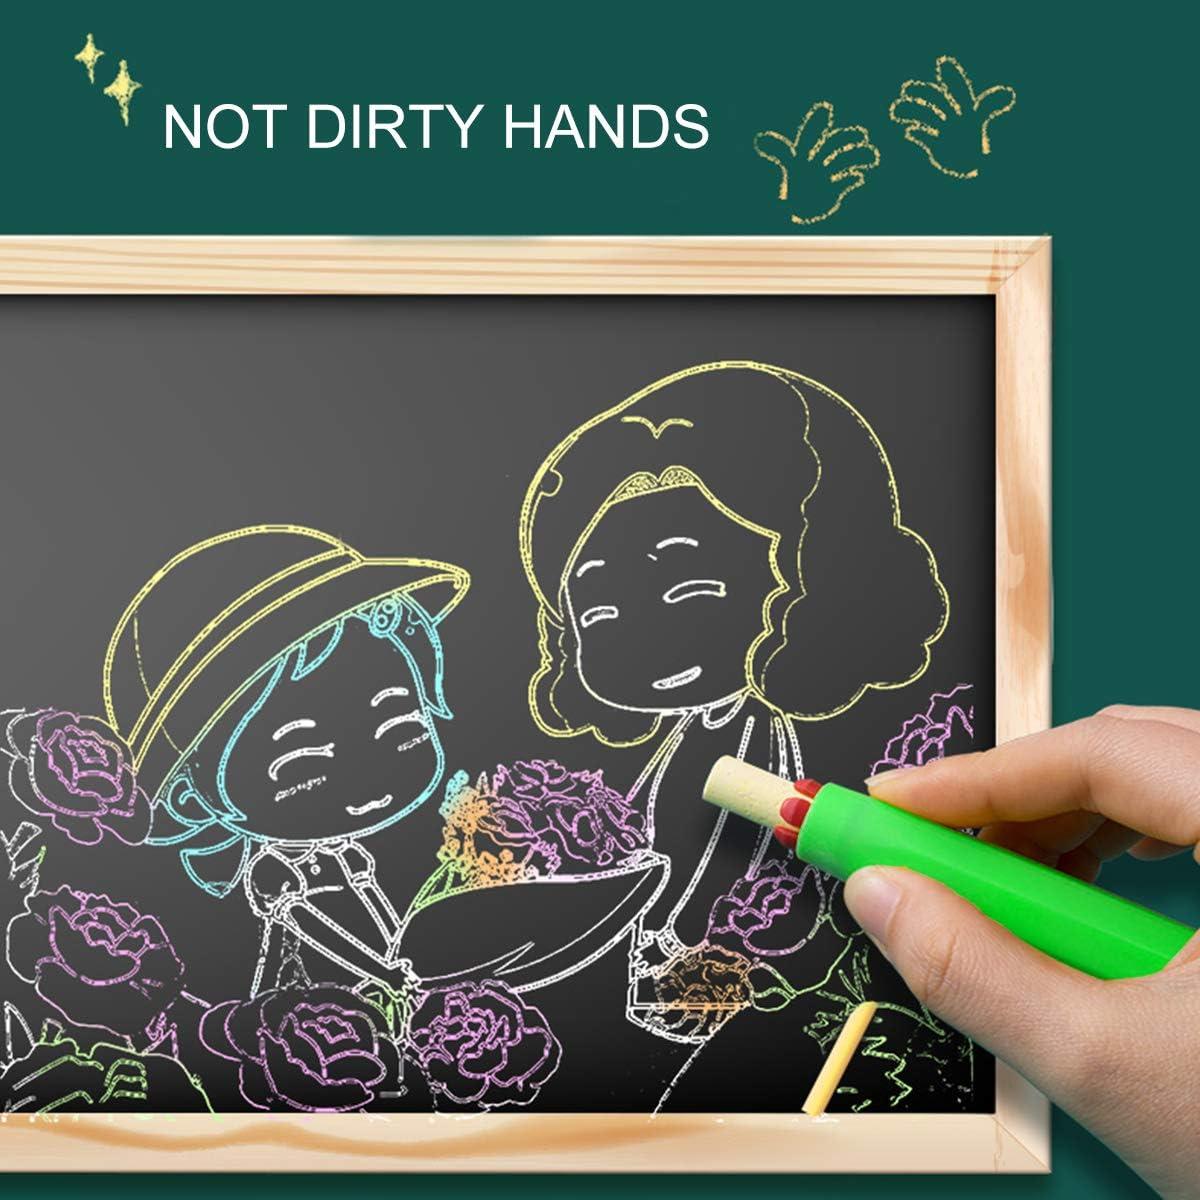 12 Piece Jumbo Pavement Washable Sidewalk Chalk Coloured Chalk Free Mobile Eraser Ylinova Kids Drawing Chalks Fun Art Game